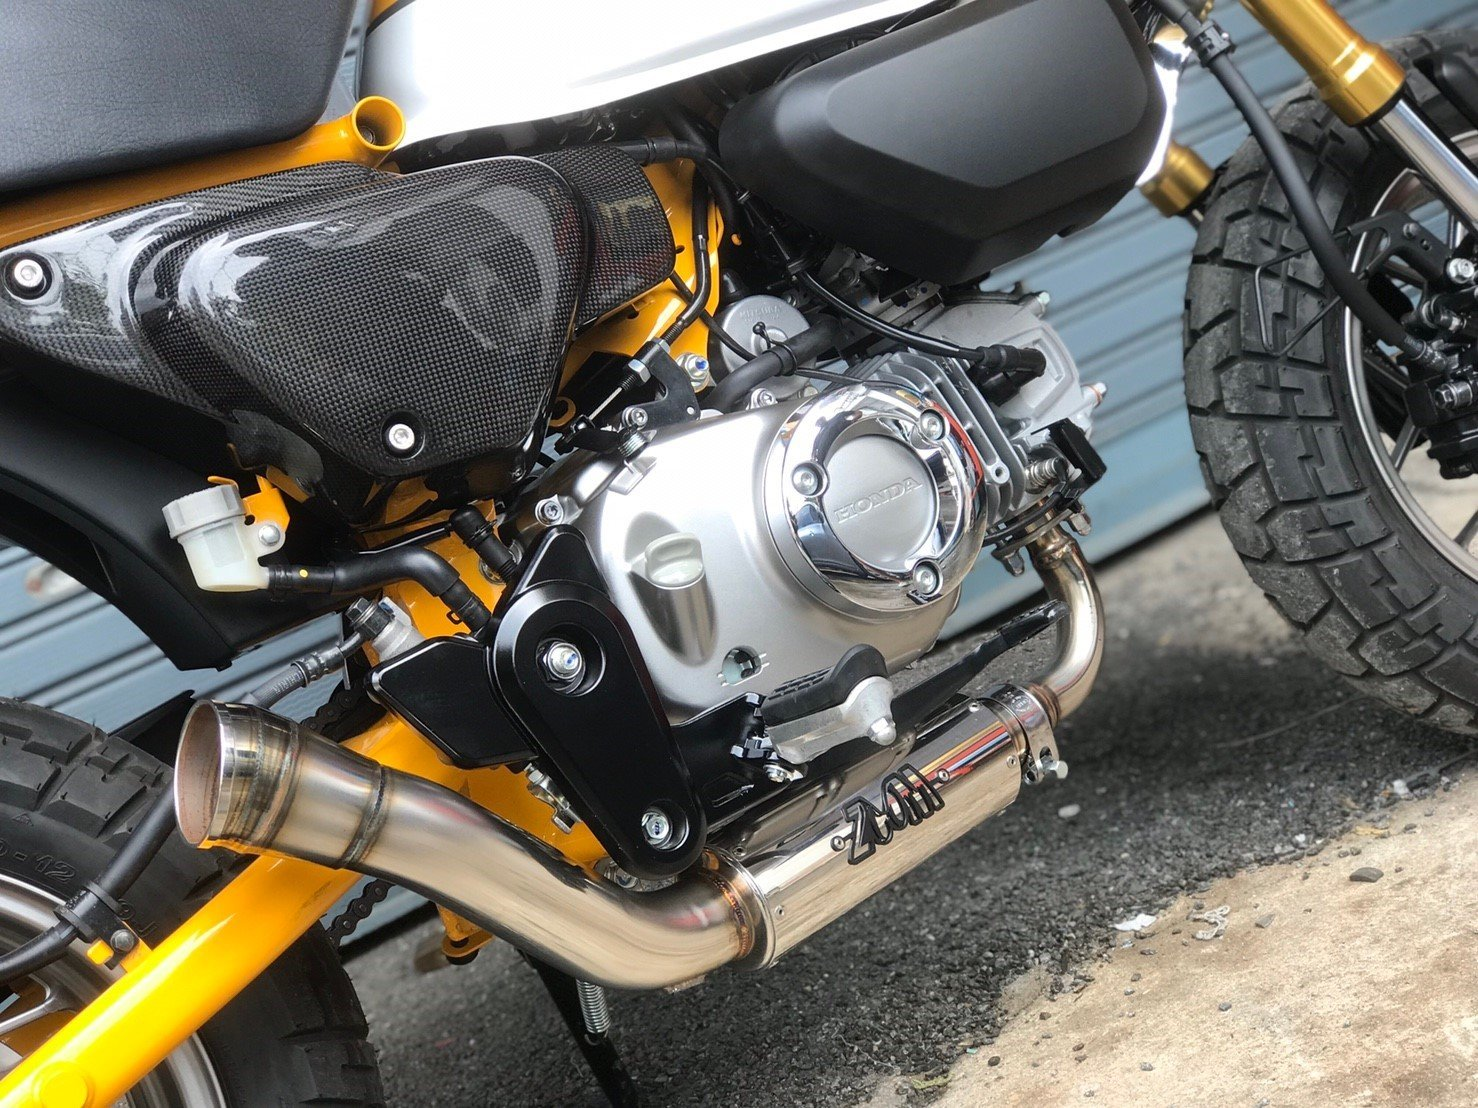 Zoom Brute Exhaust Honda Monkey 125 Full System 2018 2019 Low Mount